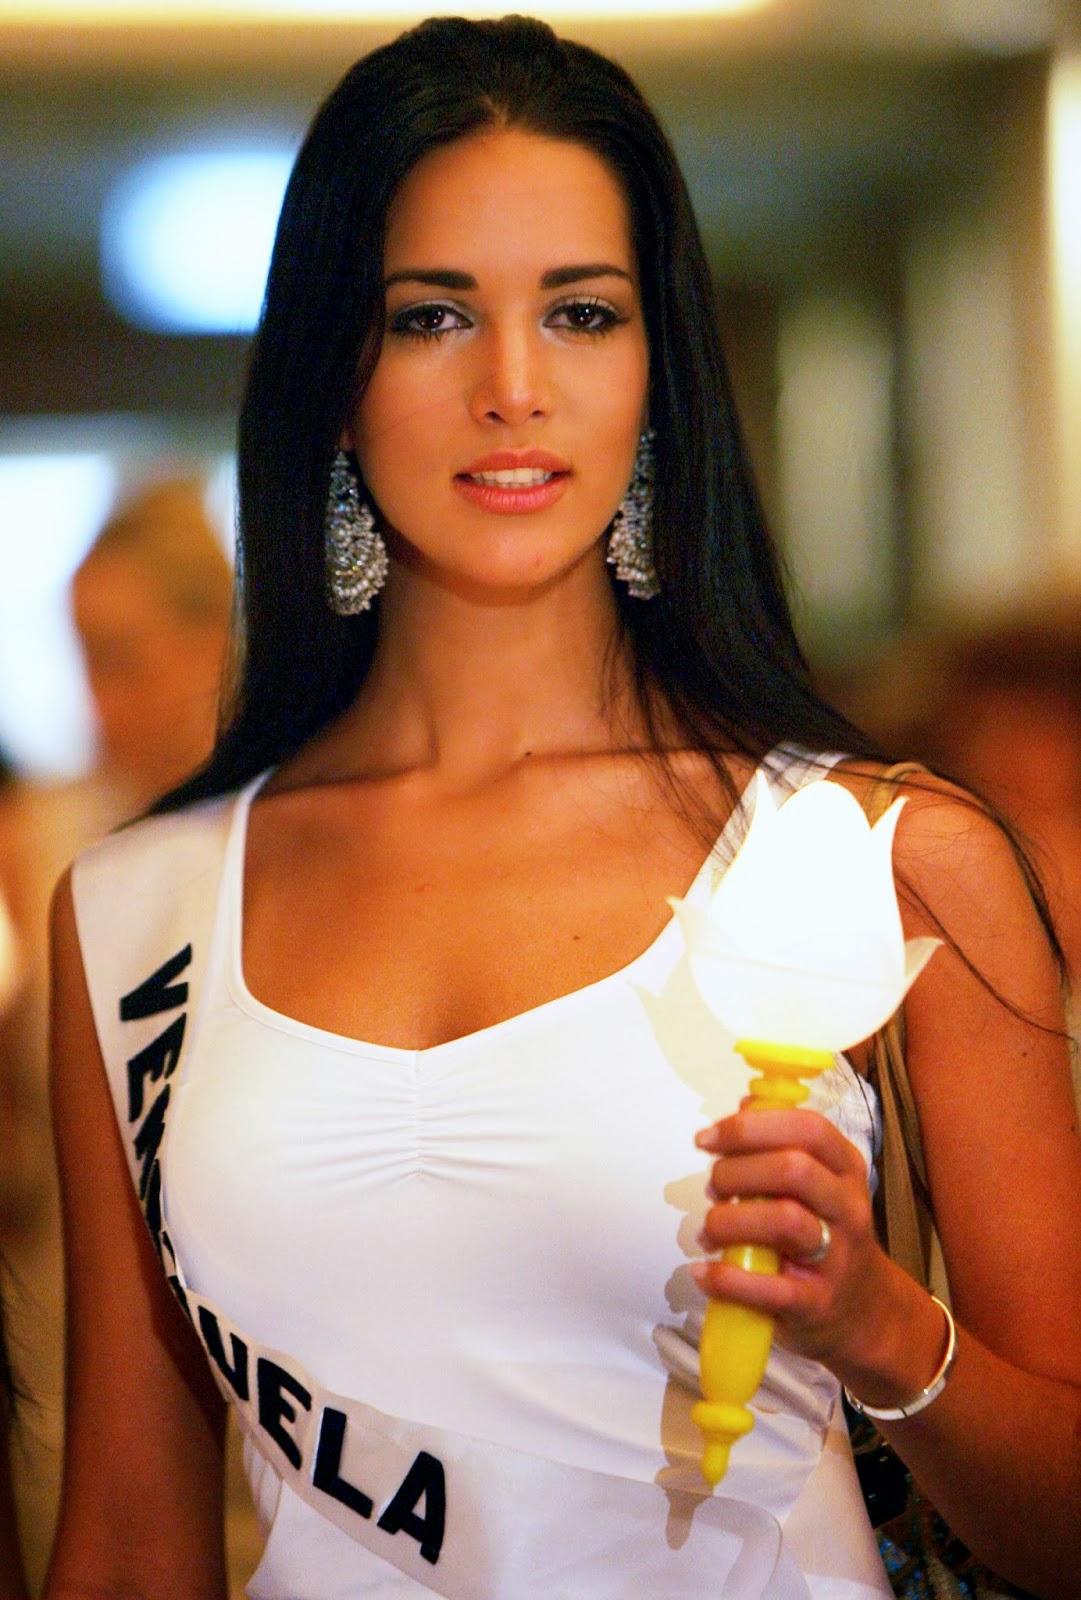 Former, Miss Venezuela, Monica Spear, Husband, Celebrate, Showbiz, Hollywood, Venezuela, 2004, Shoot, Dead, Unrest, Kill, Ex, Competition,